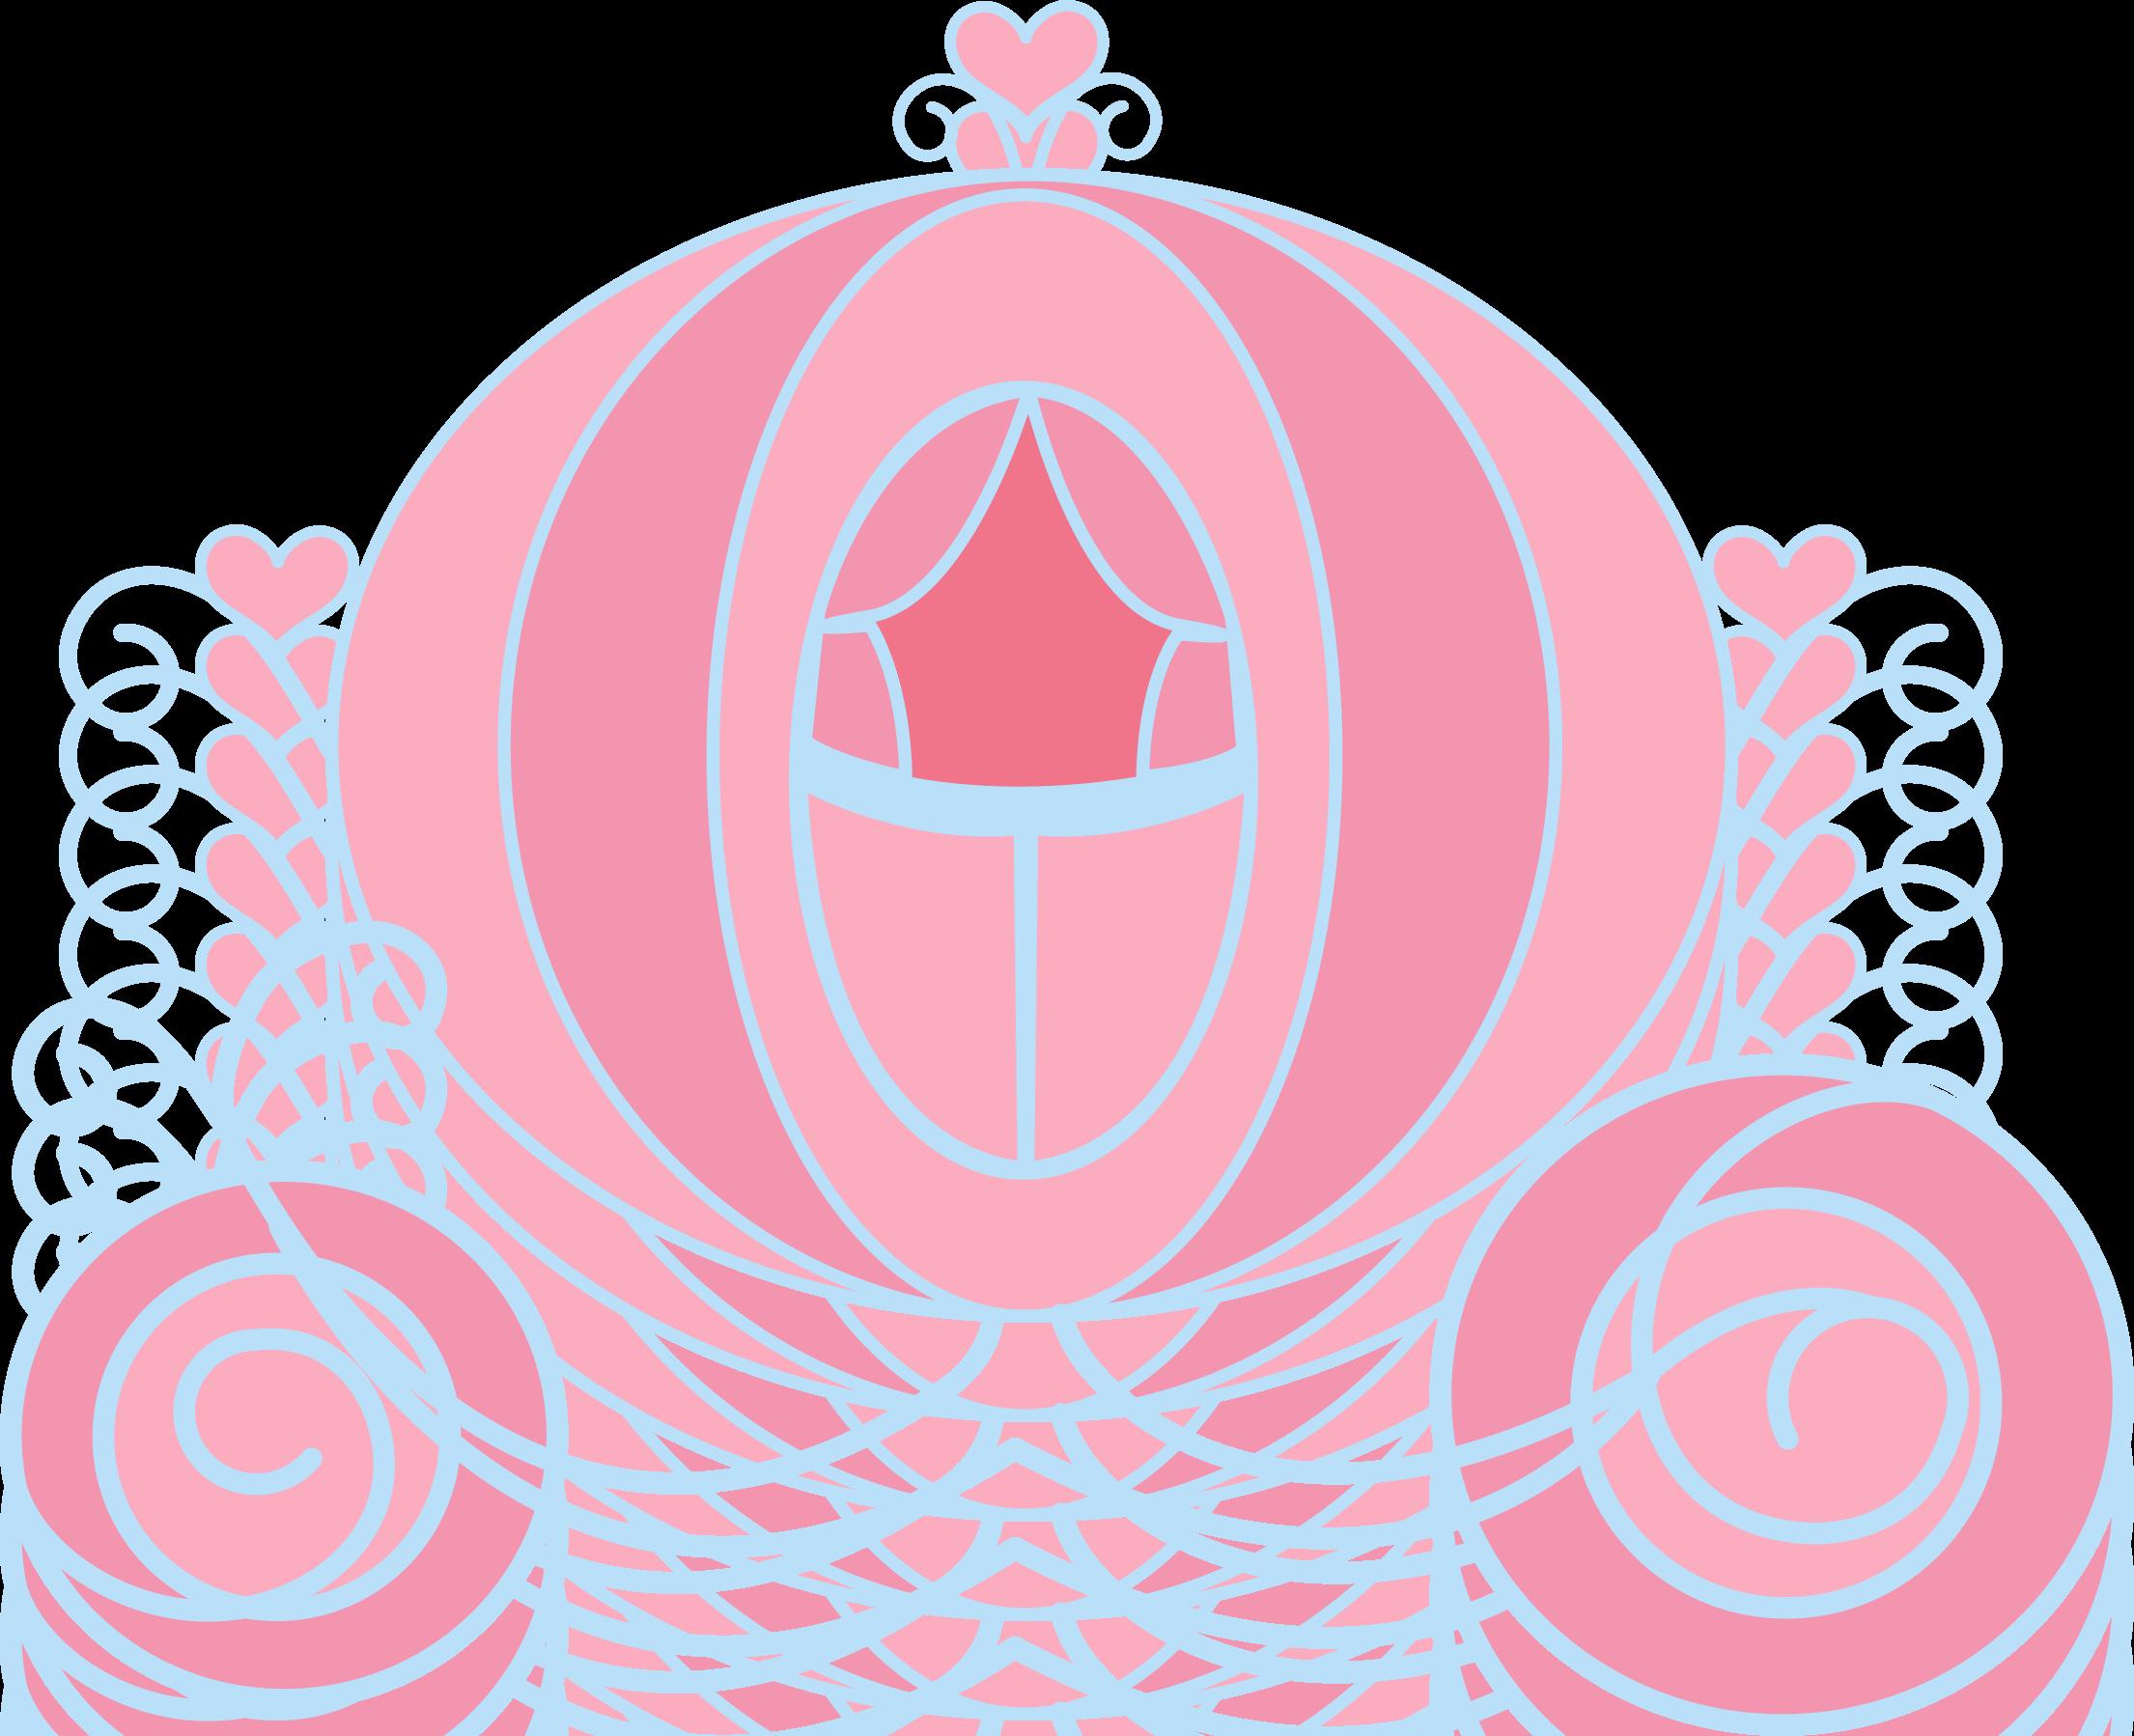 Cinderella pumpkin coach clipart image royalty free library CINDERELA | Wooden Hangers | Pinterest | Wooden hangers, Clip art ... image royalty free library